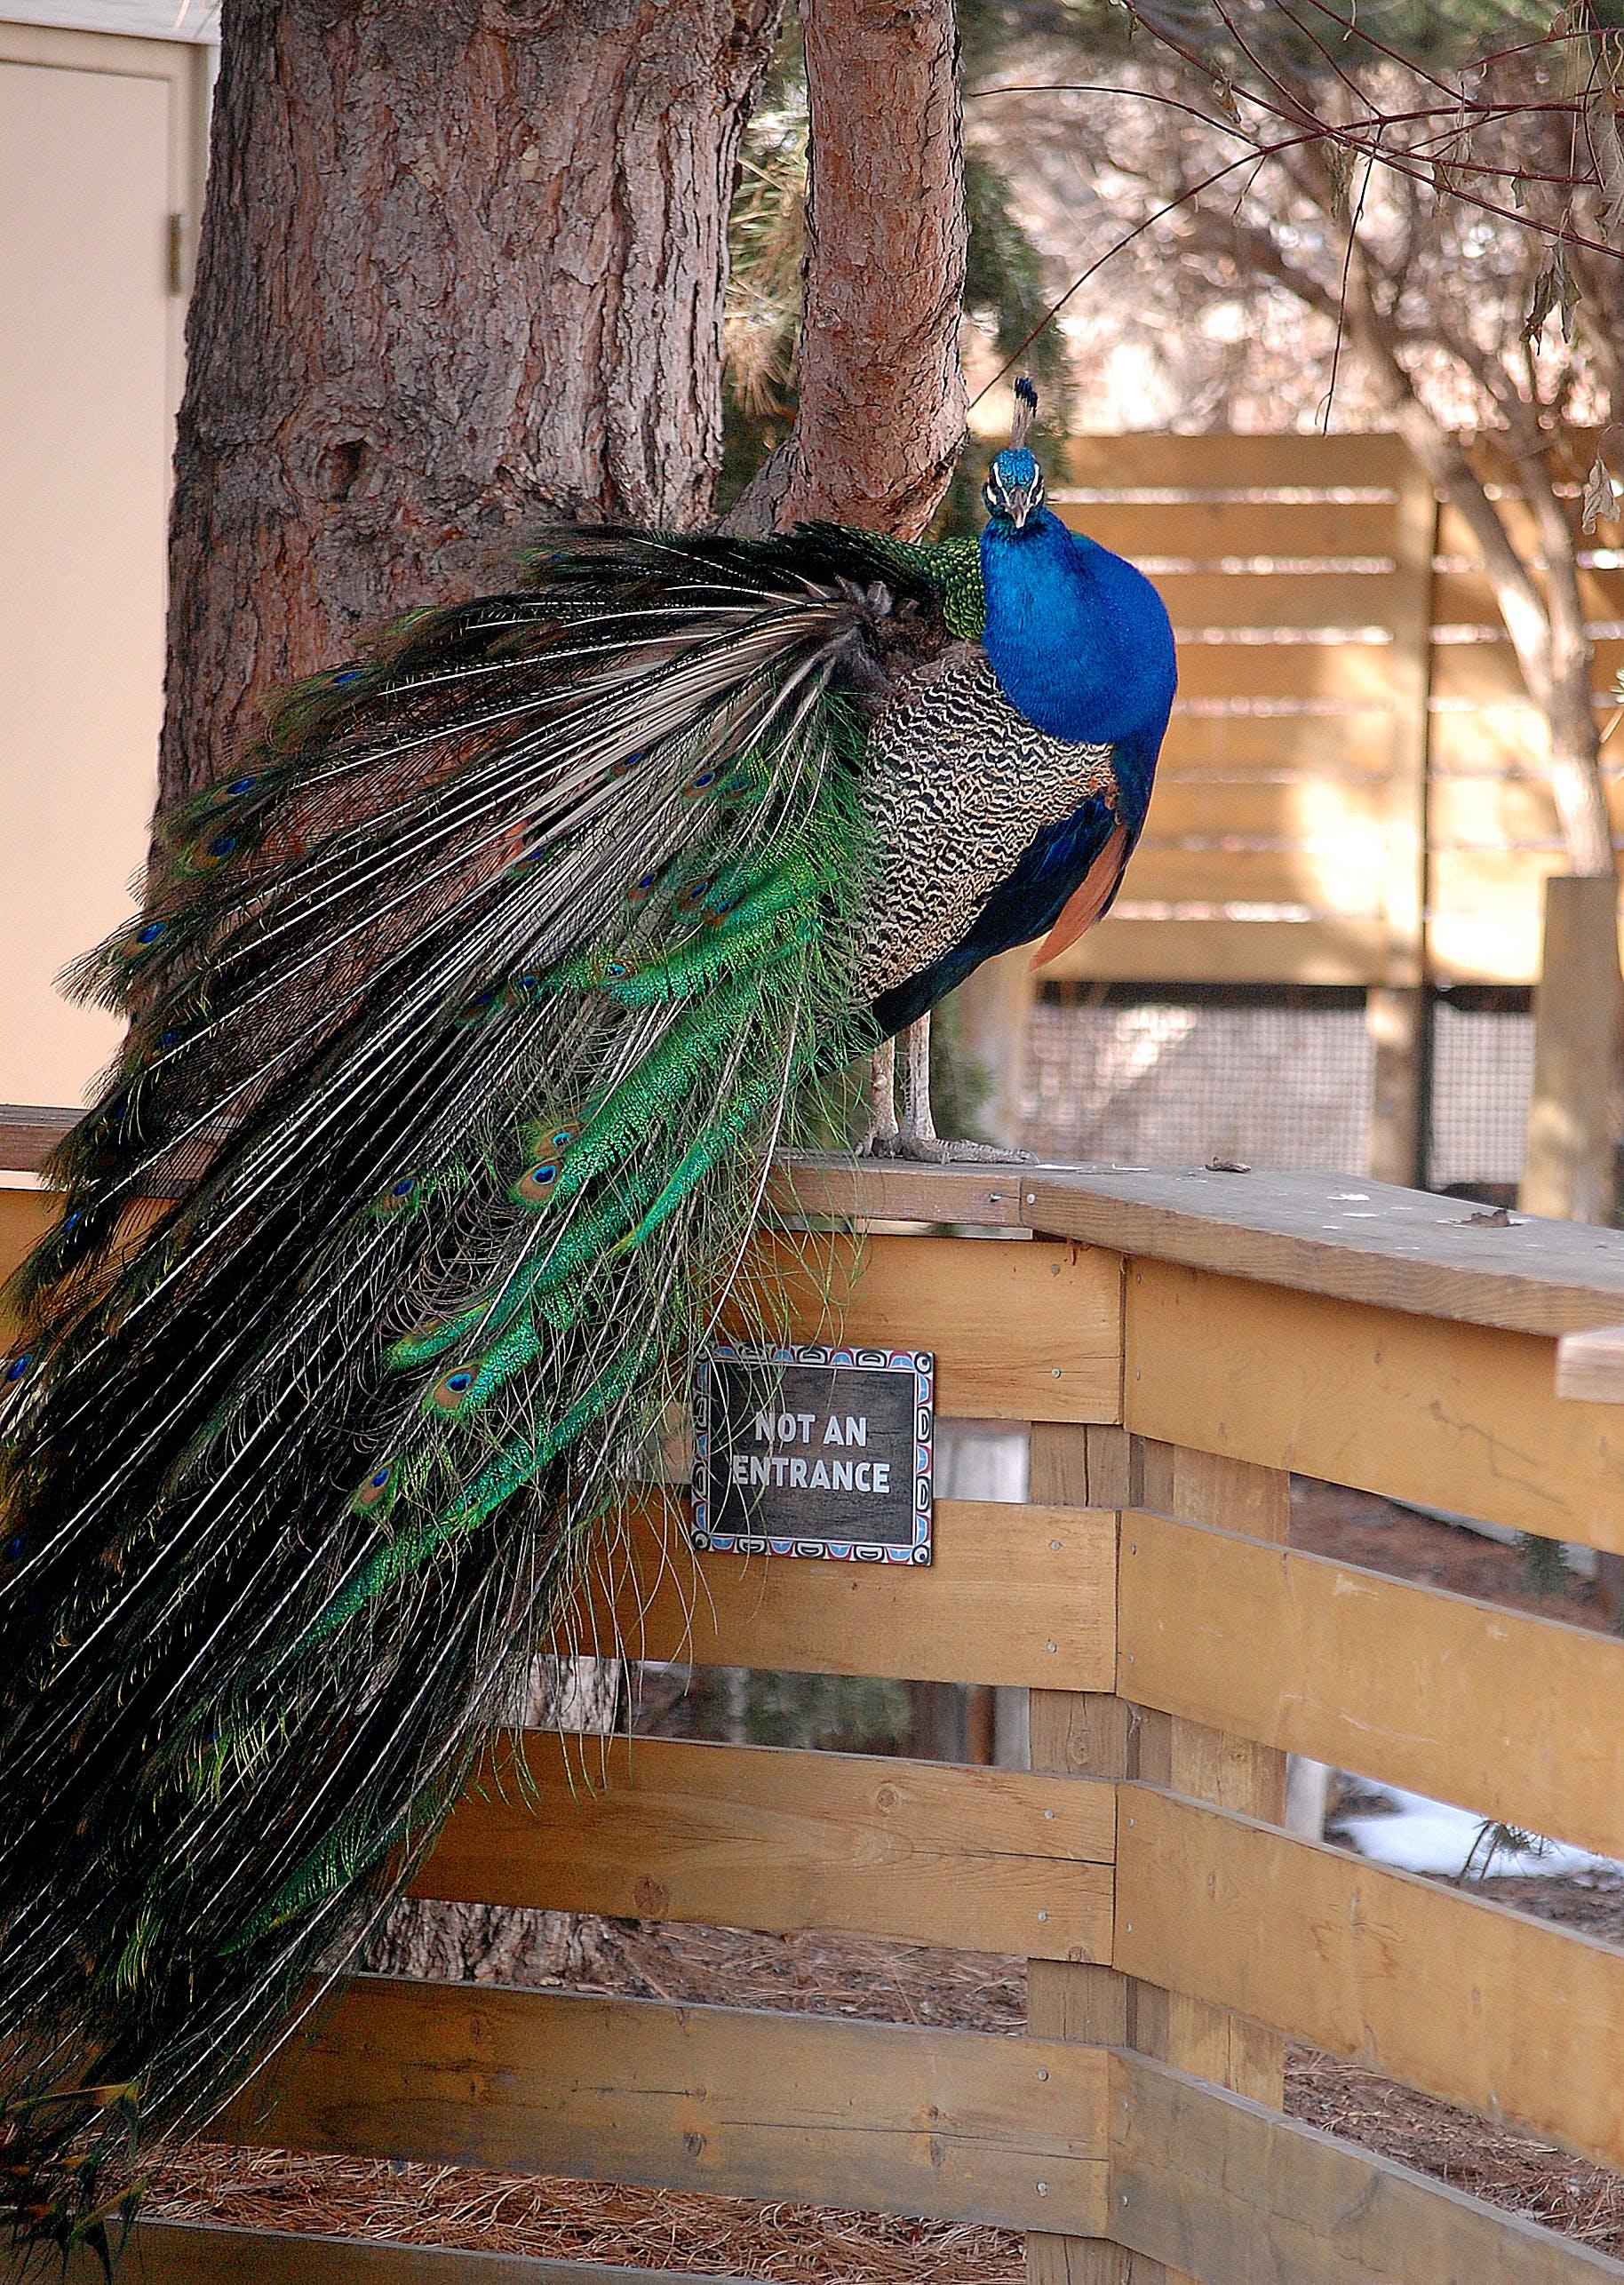 Free stock photo of Denver, peacock, zoo